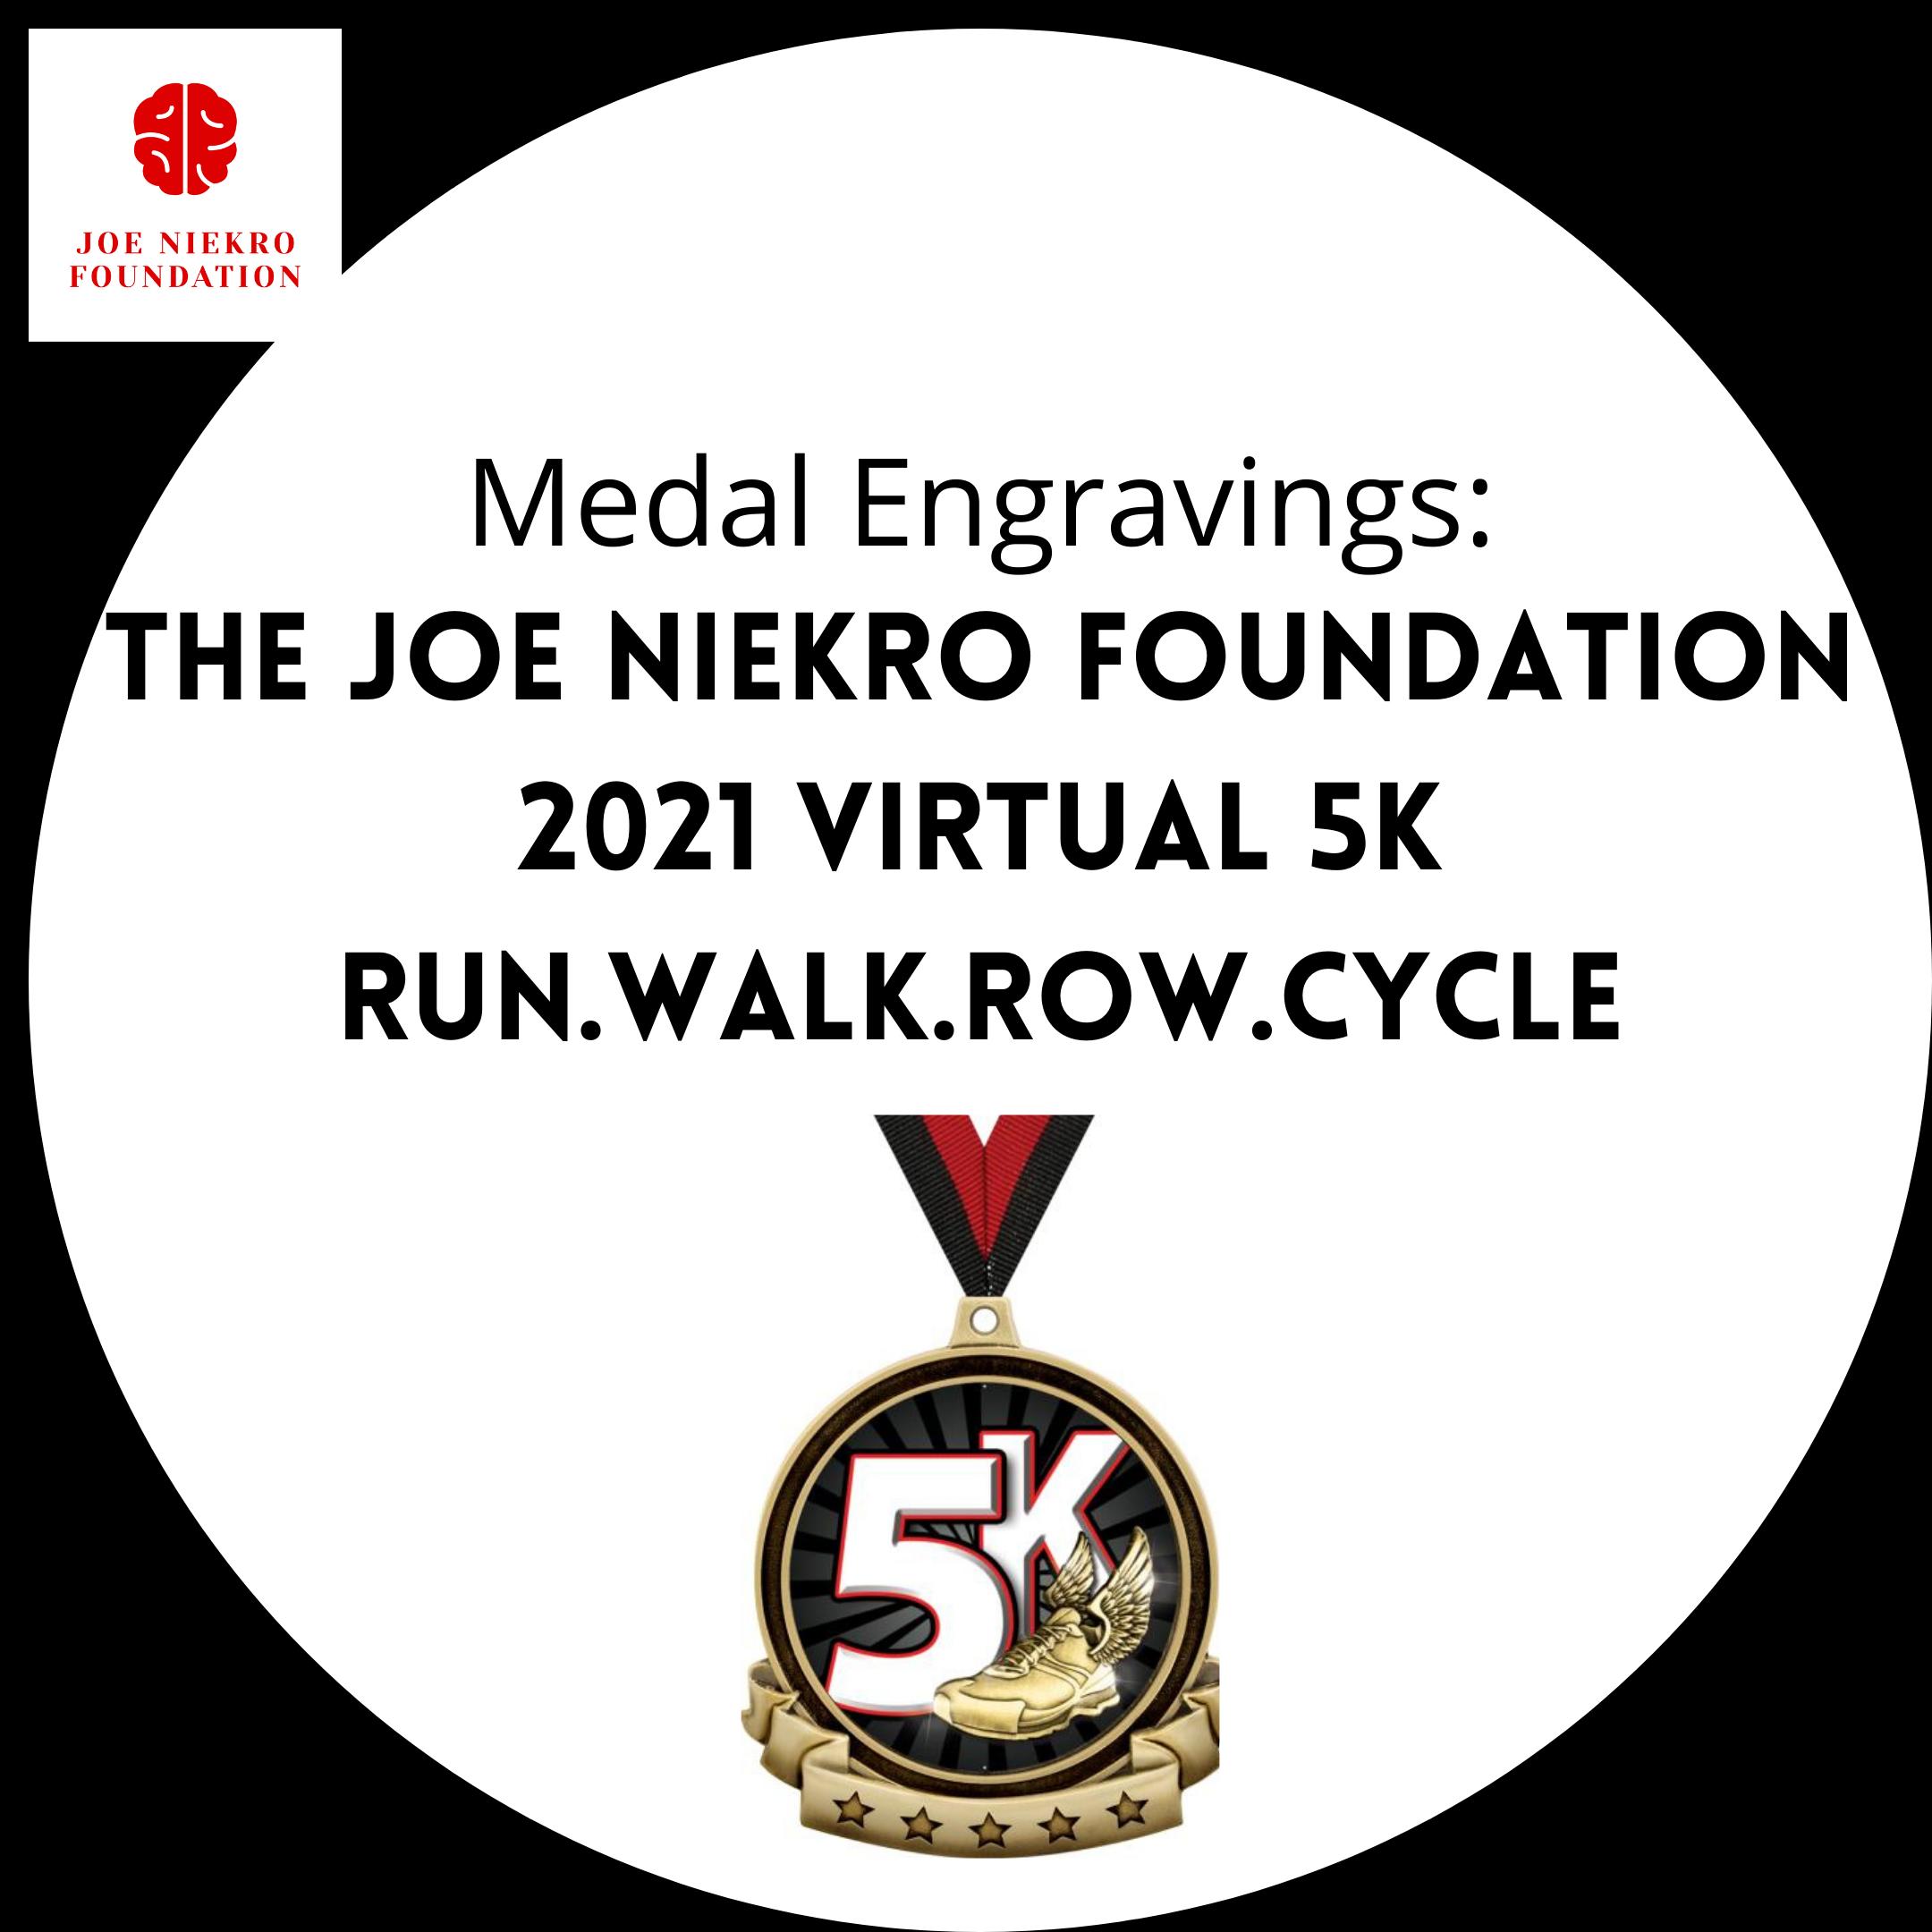 https://www.joeniekrofoundation.com/events/virtual-5k/attachment/medal/